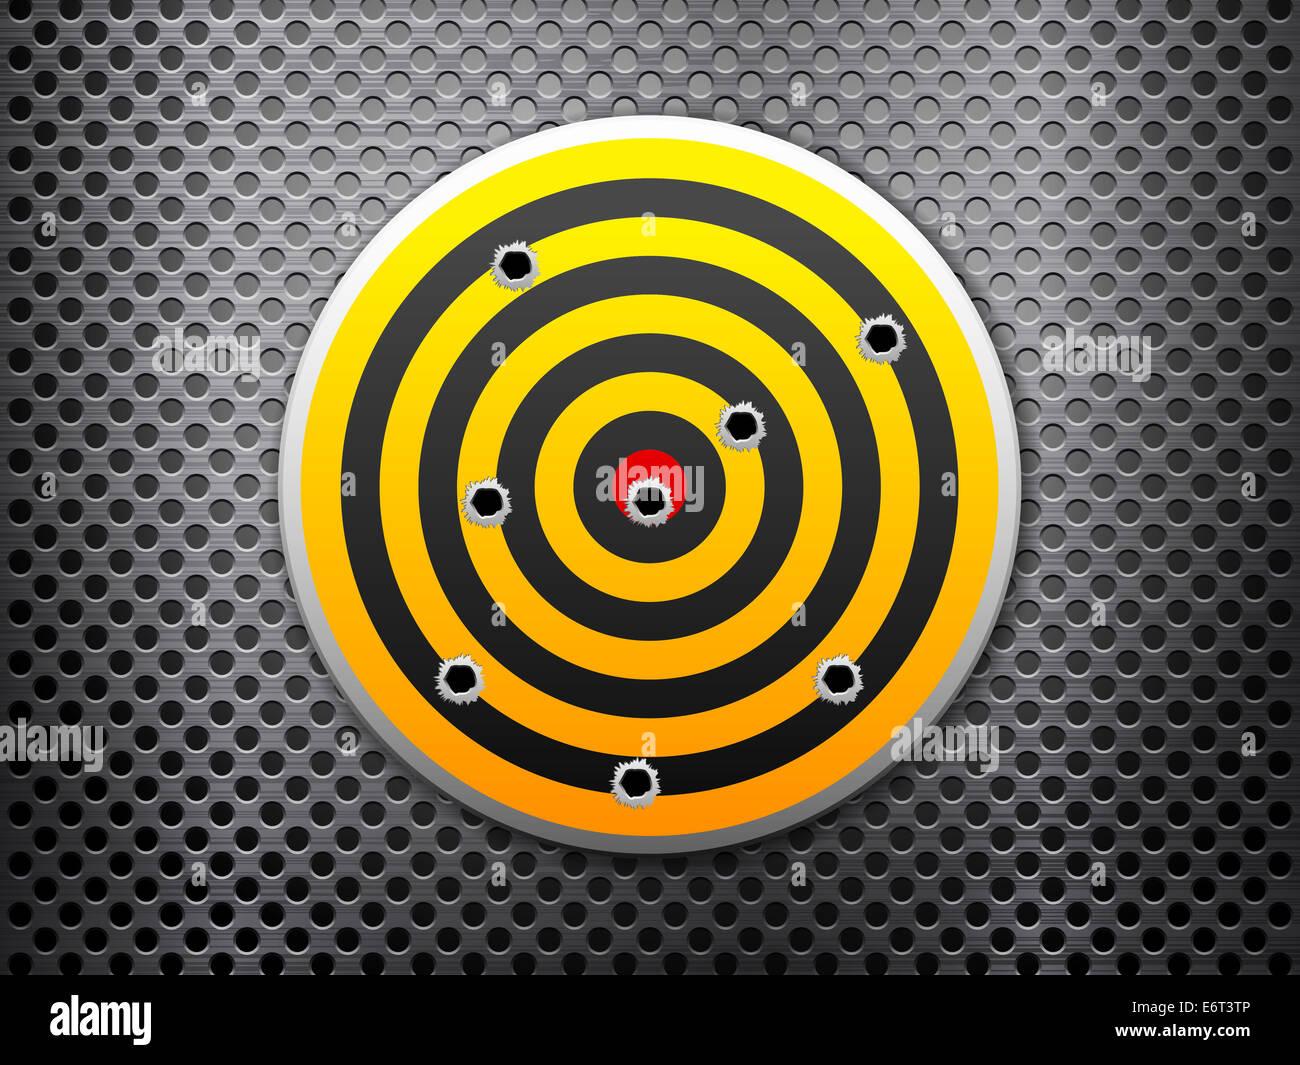 Target Bullet Holes On Metal Stock Photos & Target Bullet Holes On ...